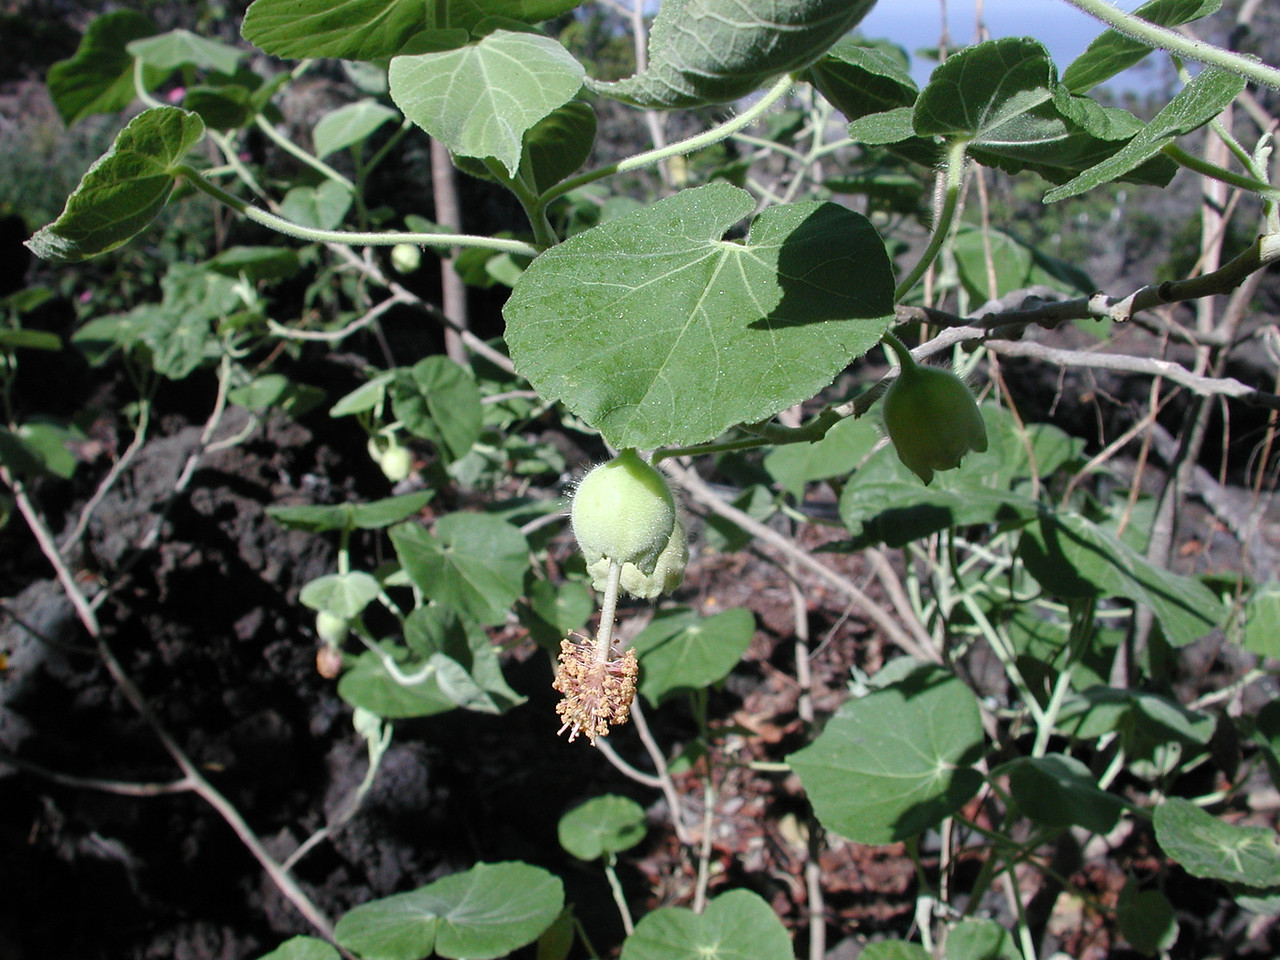 Abutilon eremitopetalum